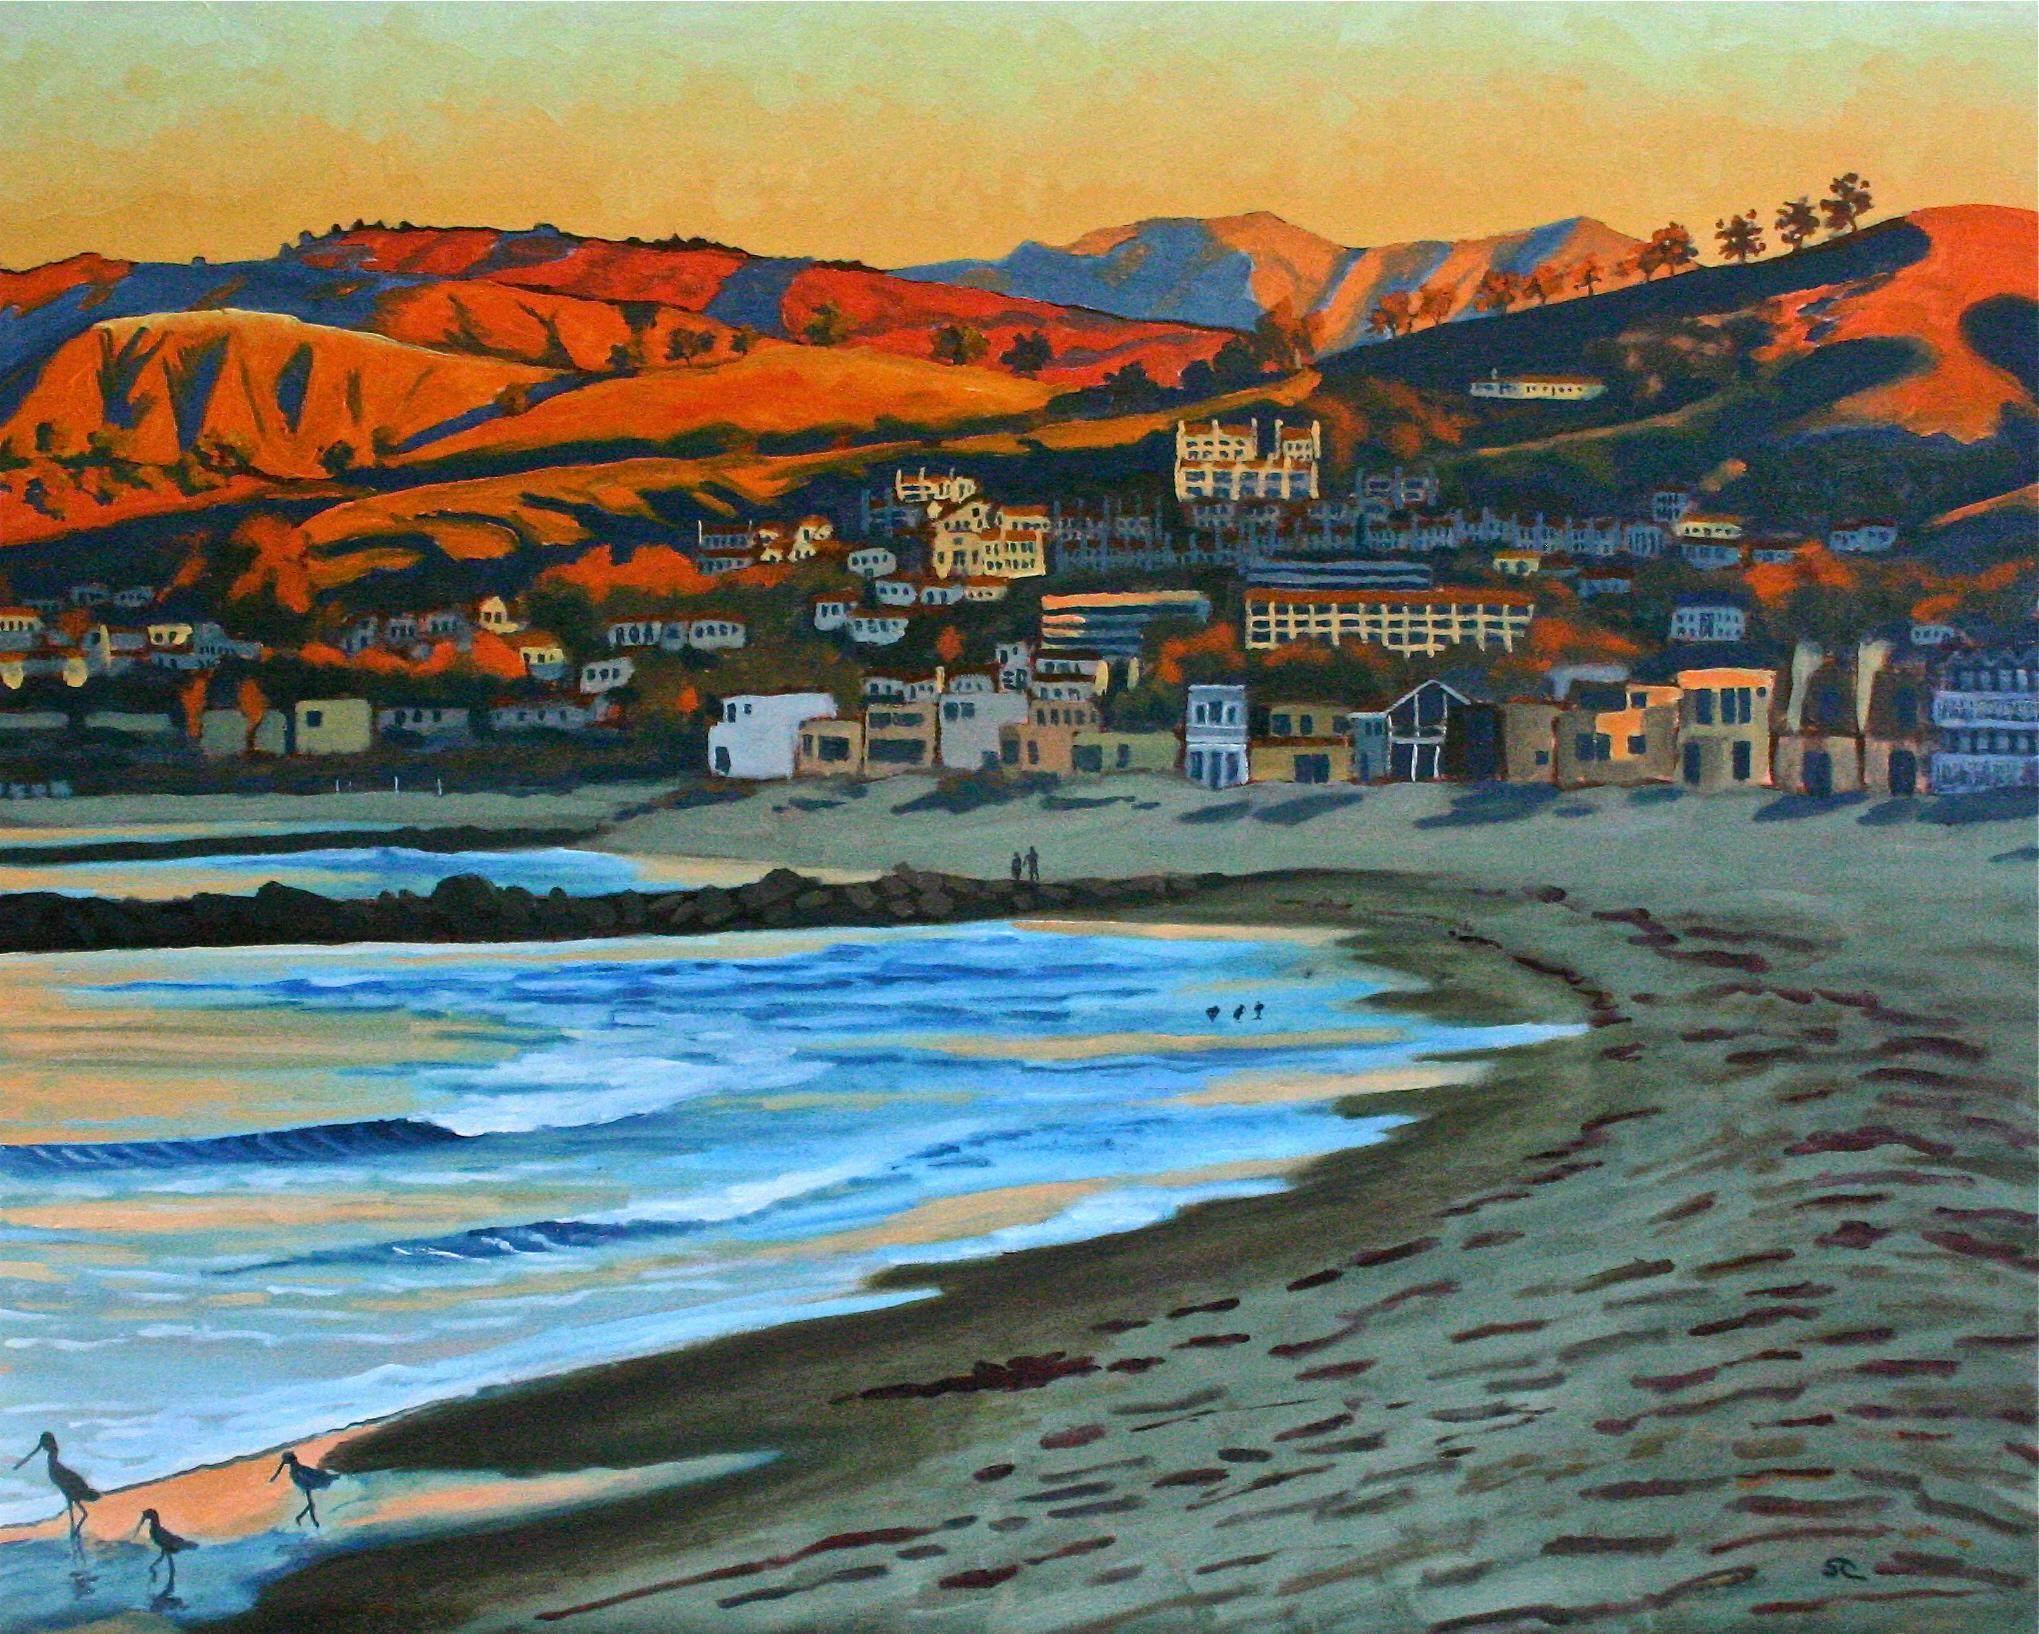 """Pierpont Sunrise"" oil on canvas 24 x 30 sold"